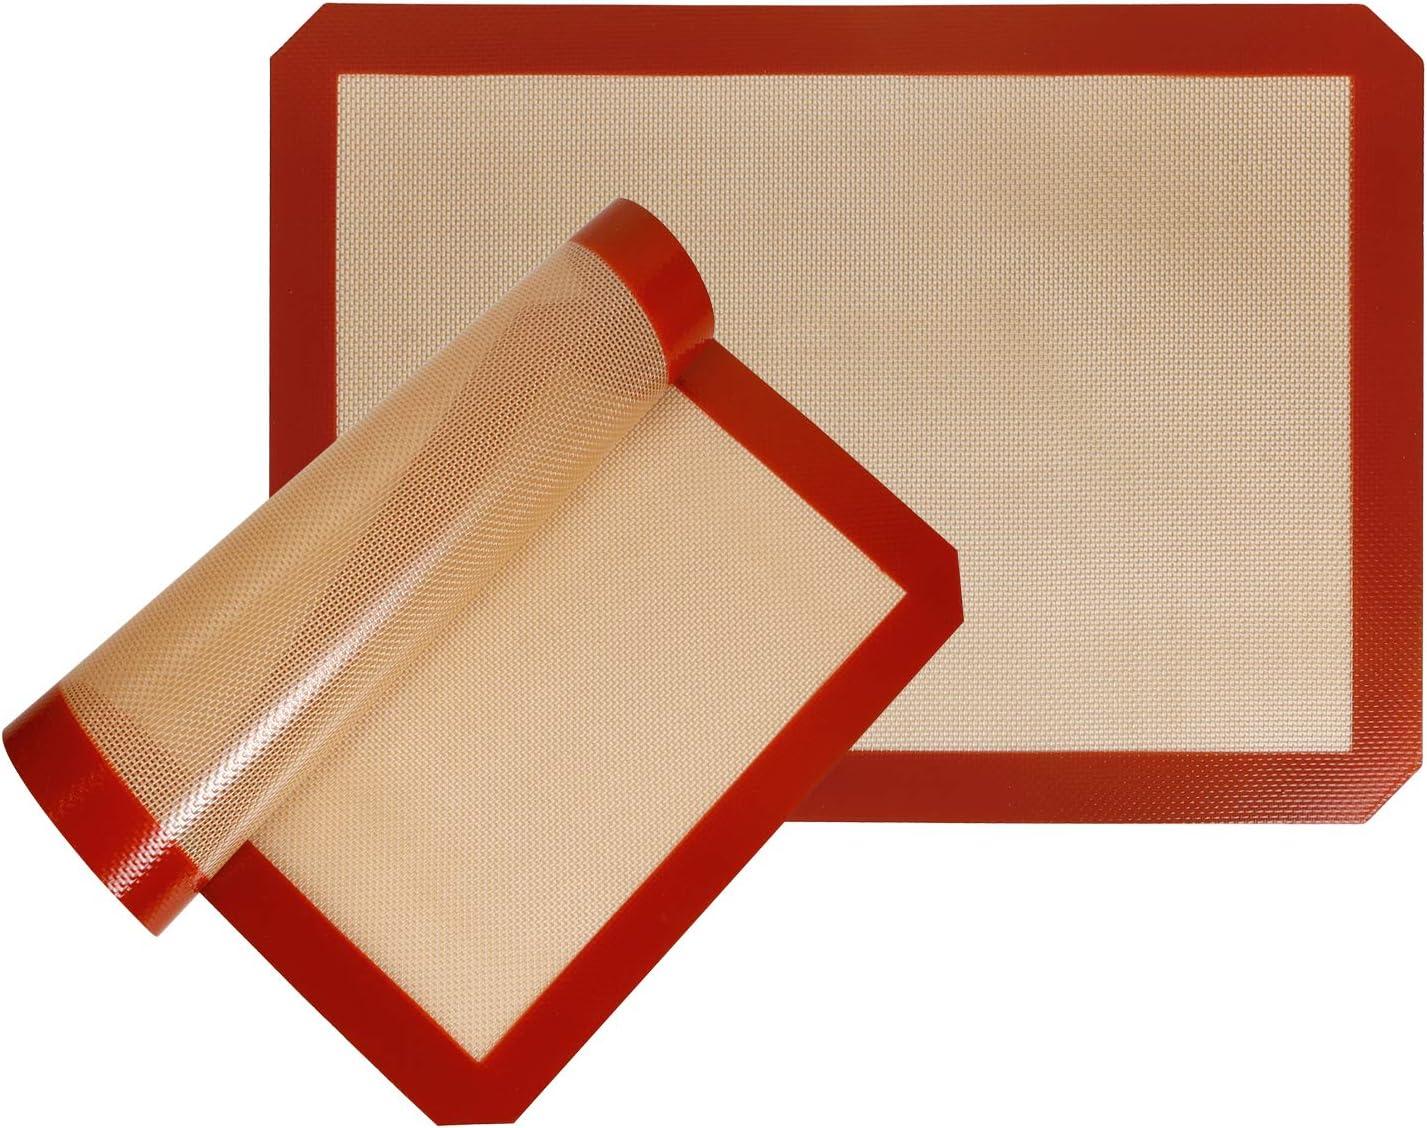 STATINT Non-Stick Silicone Baking Mat Premium Safe Max 61% OFF Food Pack - Kansas City Mall